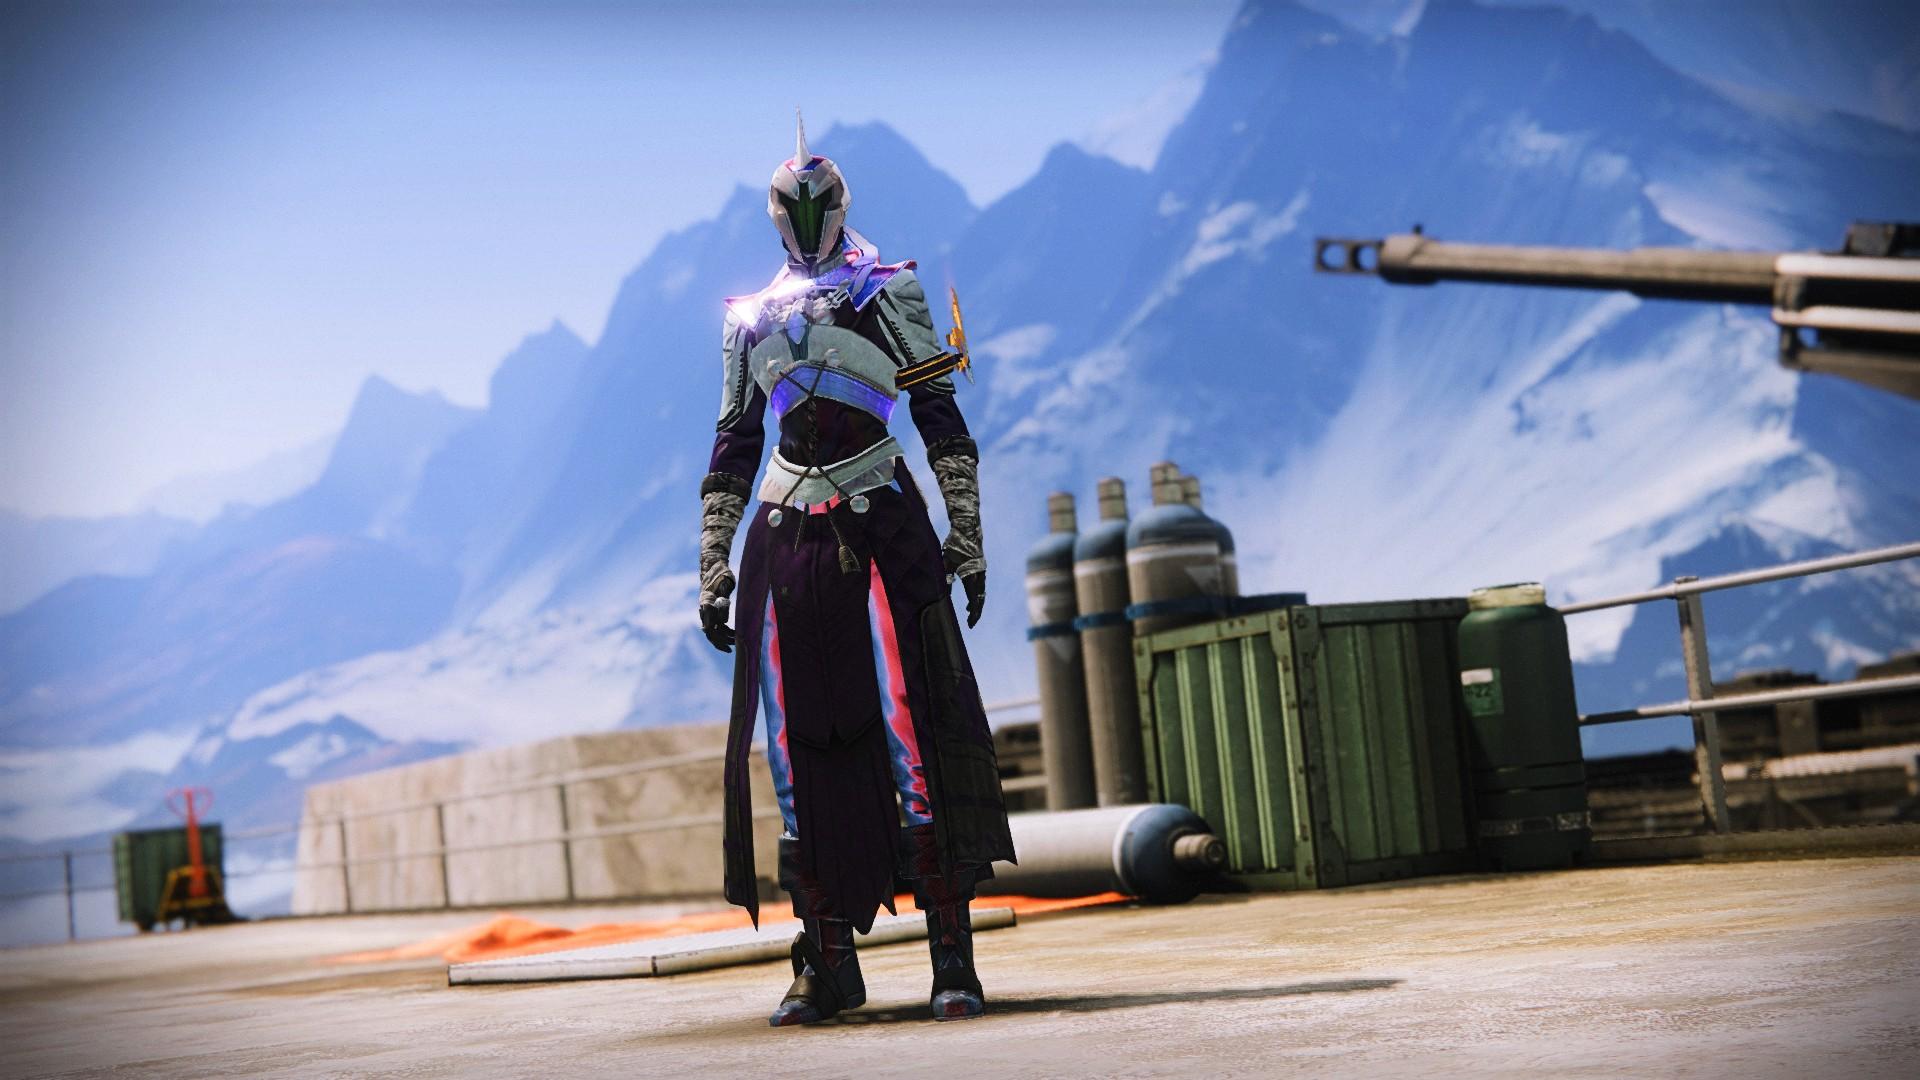 Destiny 2's new transmog system looks like a grind